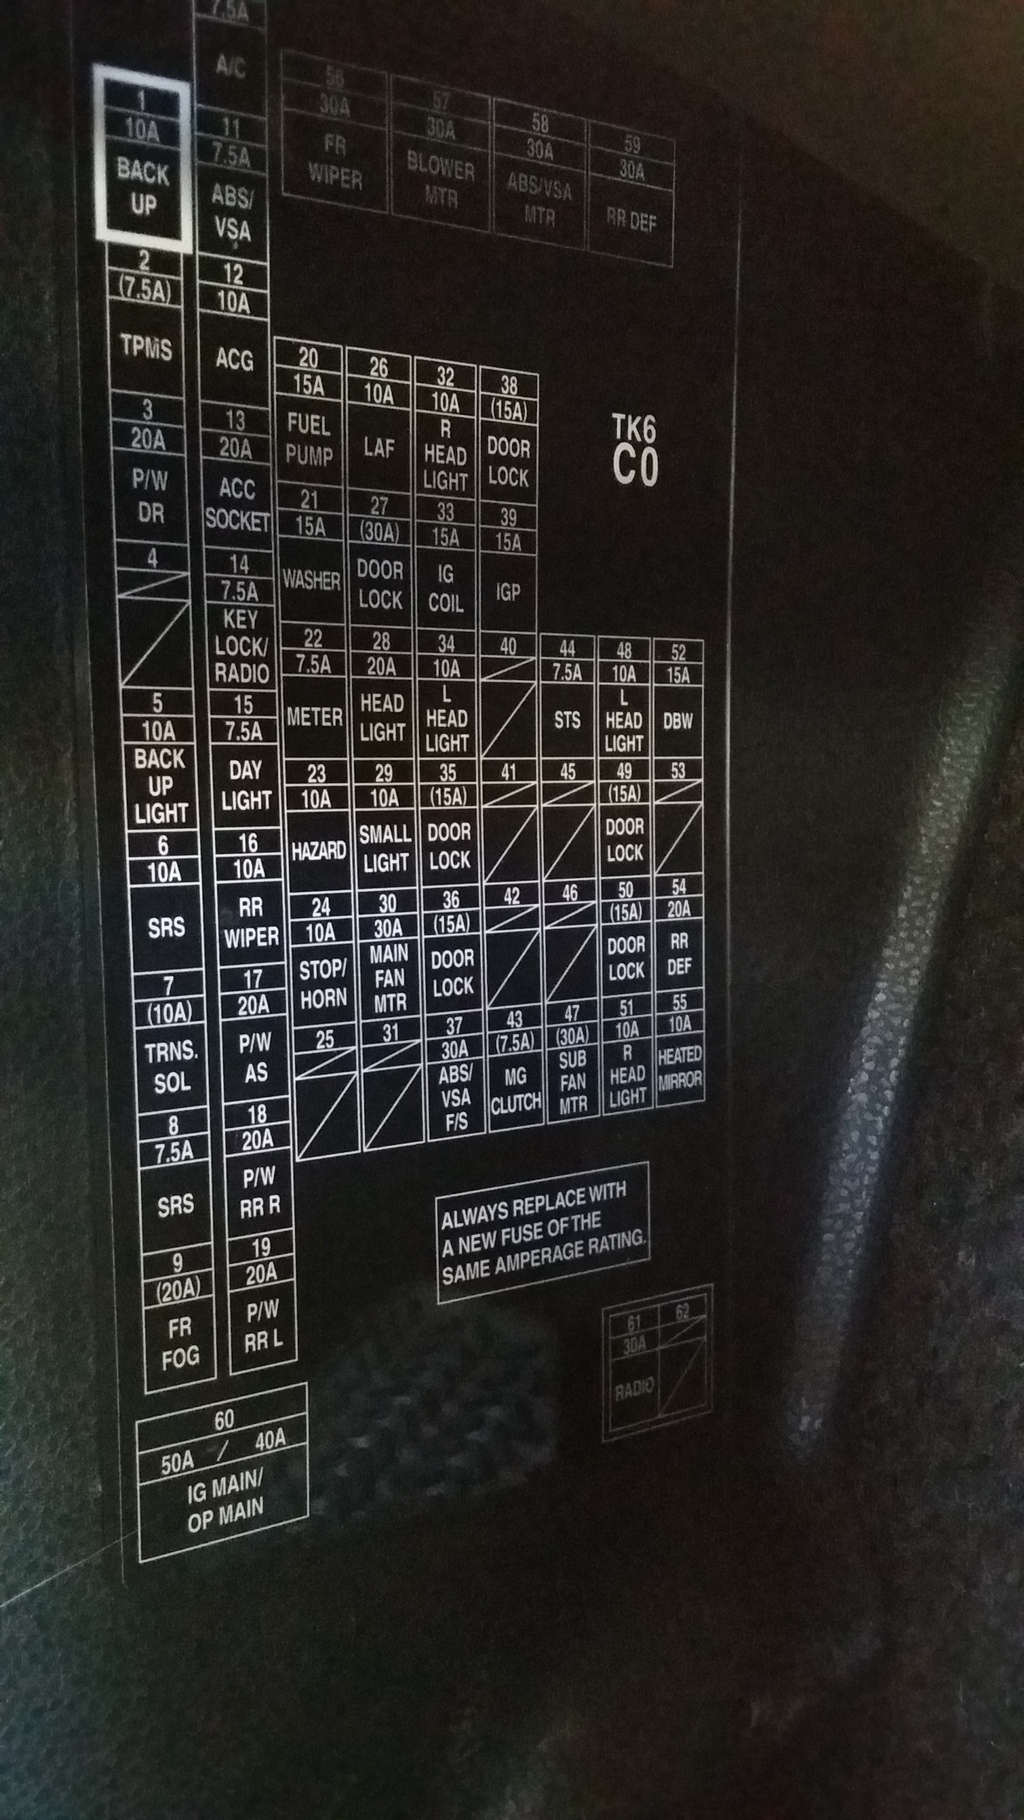 Glamorous Mercedes C300 Fuse Box 01 F350 2002 Fuse Diagram Kawasaki ...